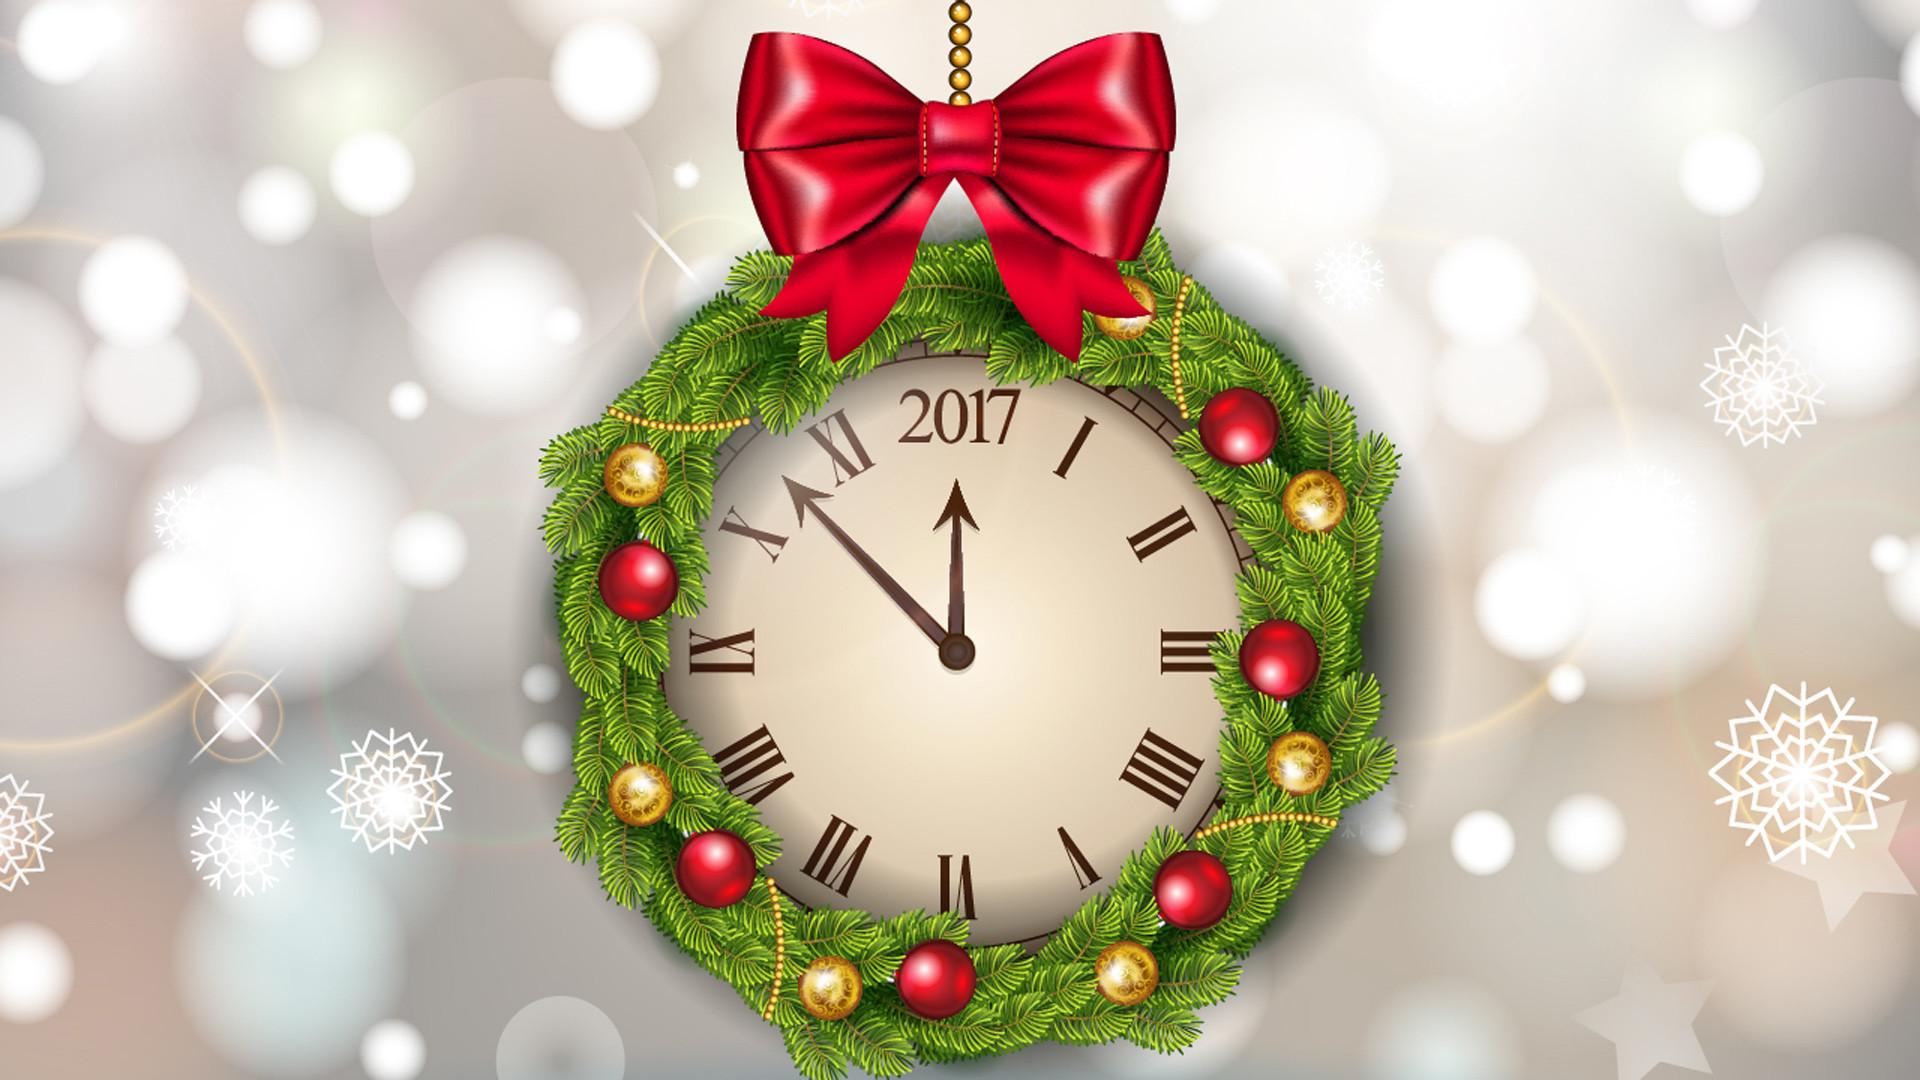 Holiday – New Year 2017 Holiday New Year Wreath Clock Wallpaper